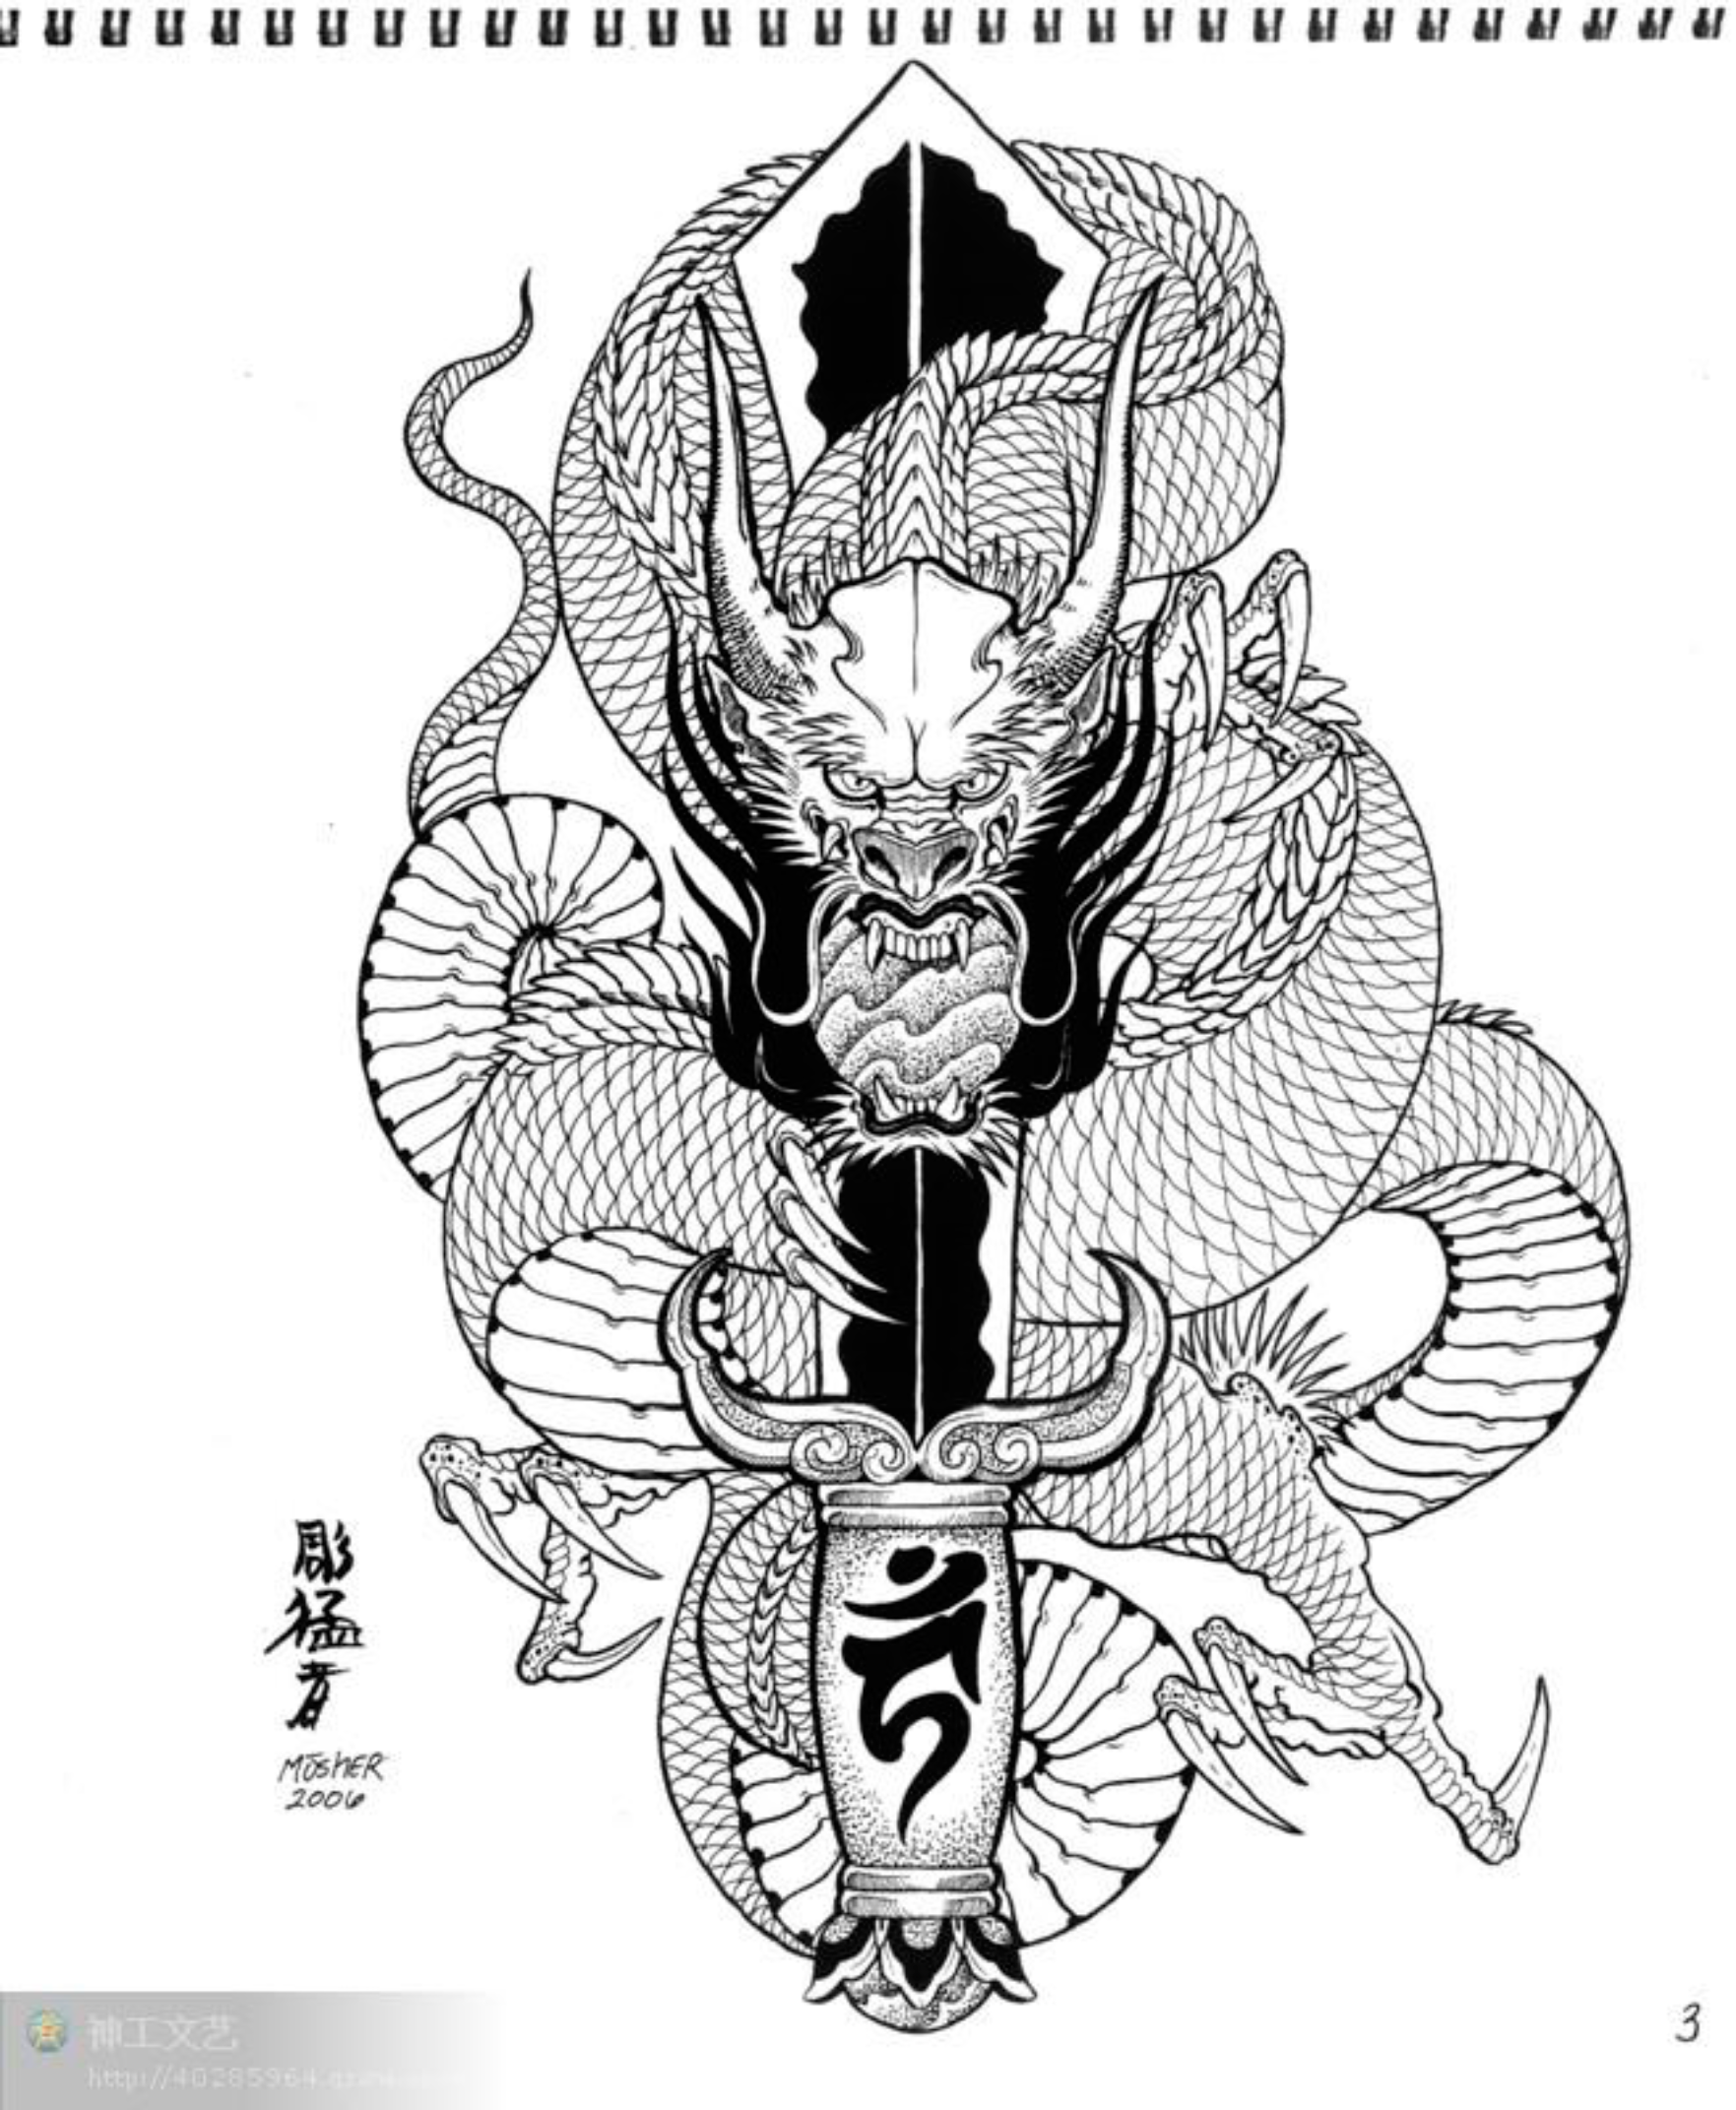 Tattoo Art Black And White: Pin By 丽江刺青工作室微信15999955381 On 龙 Ta T Too